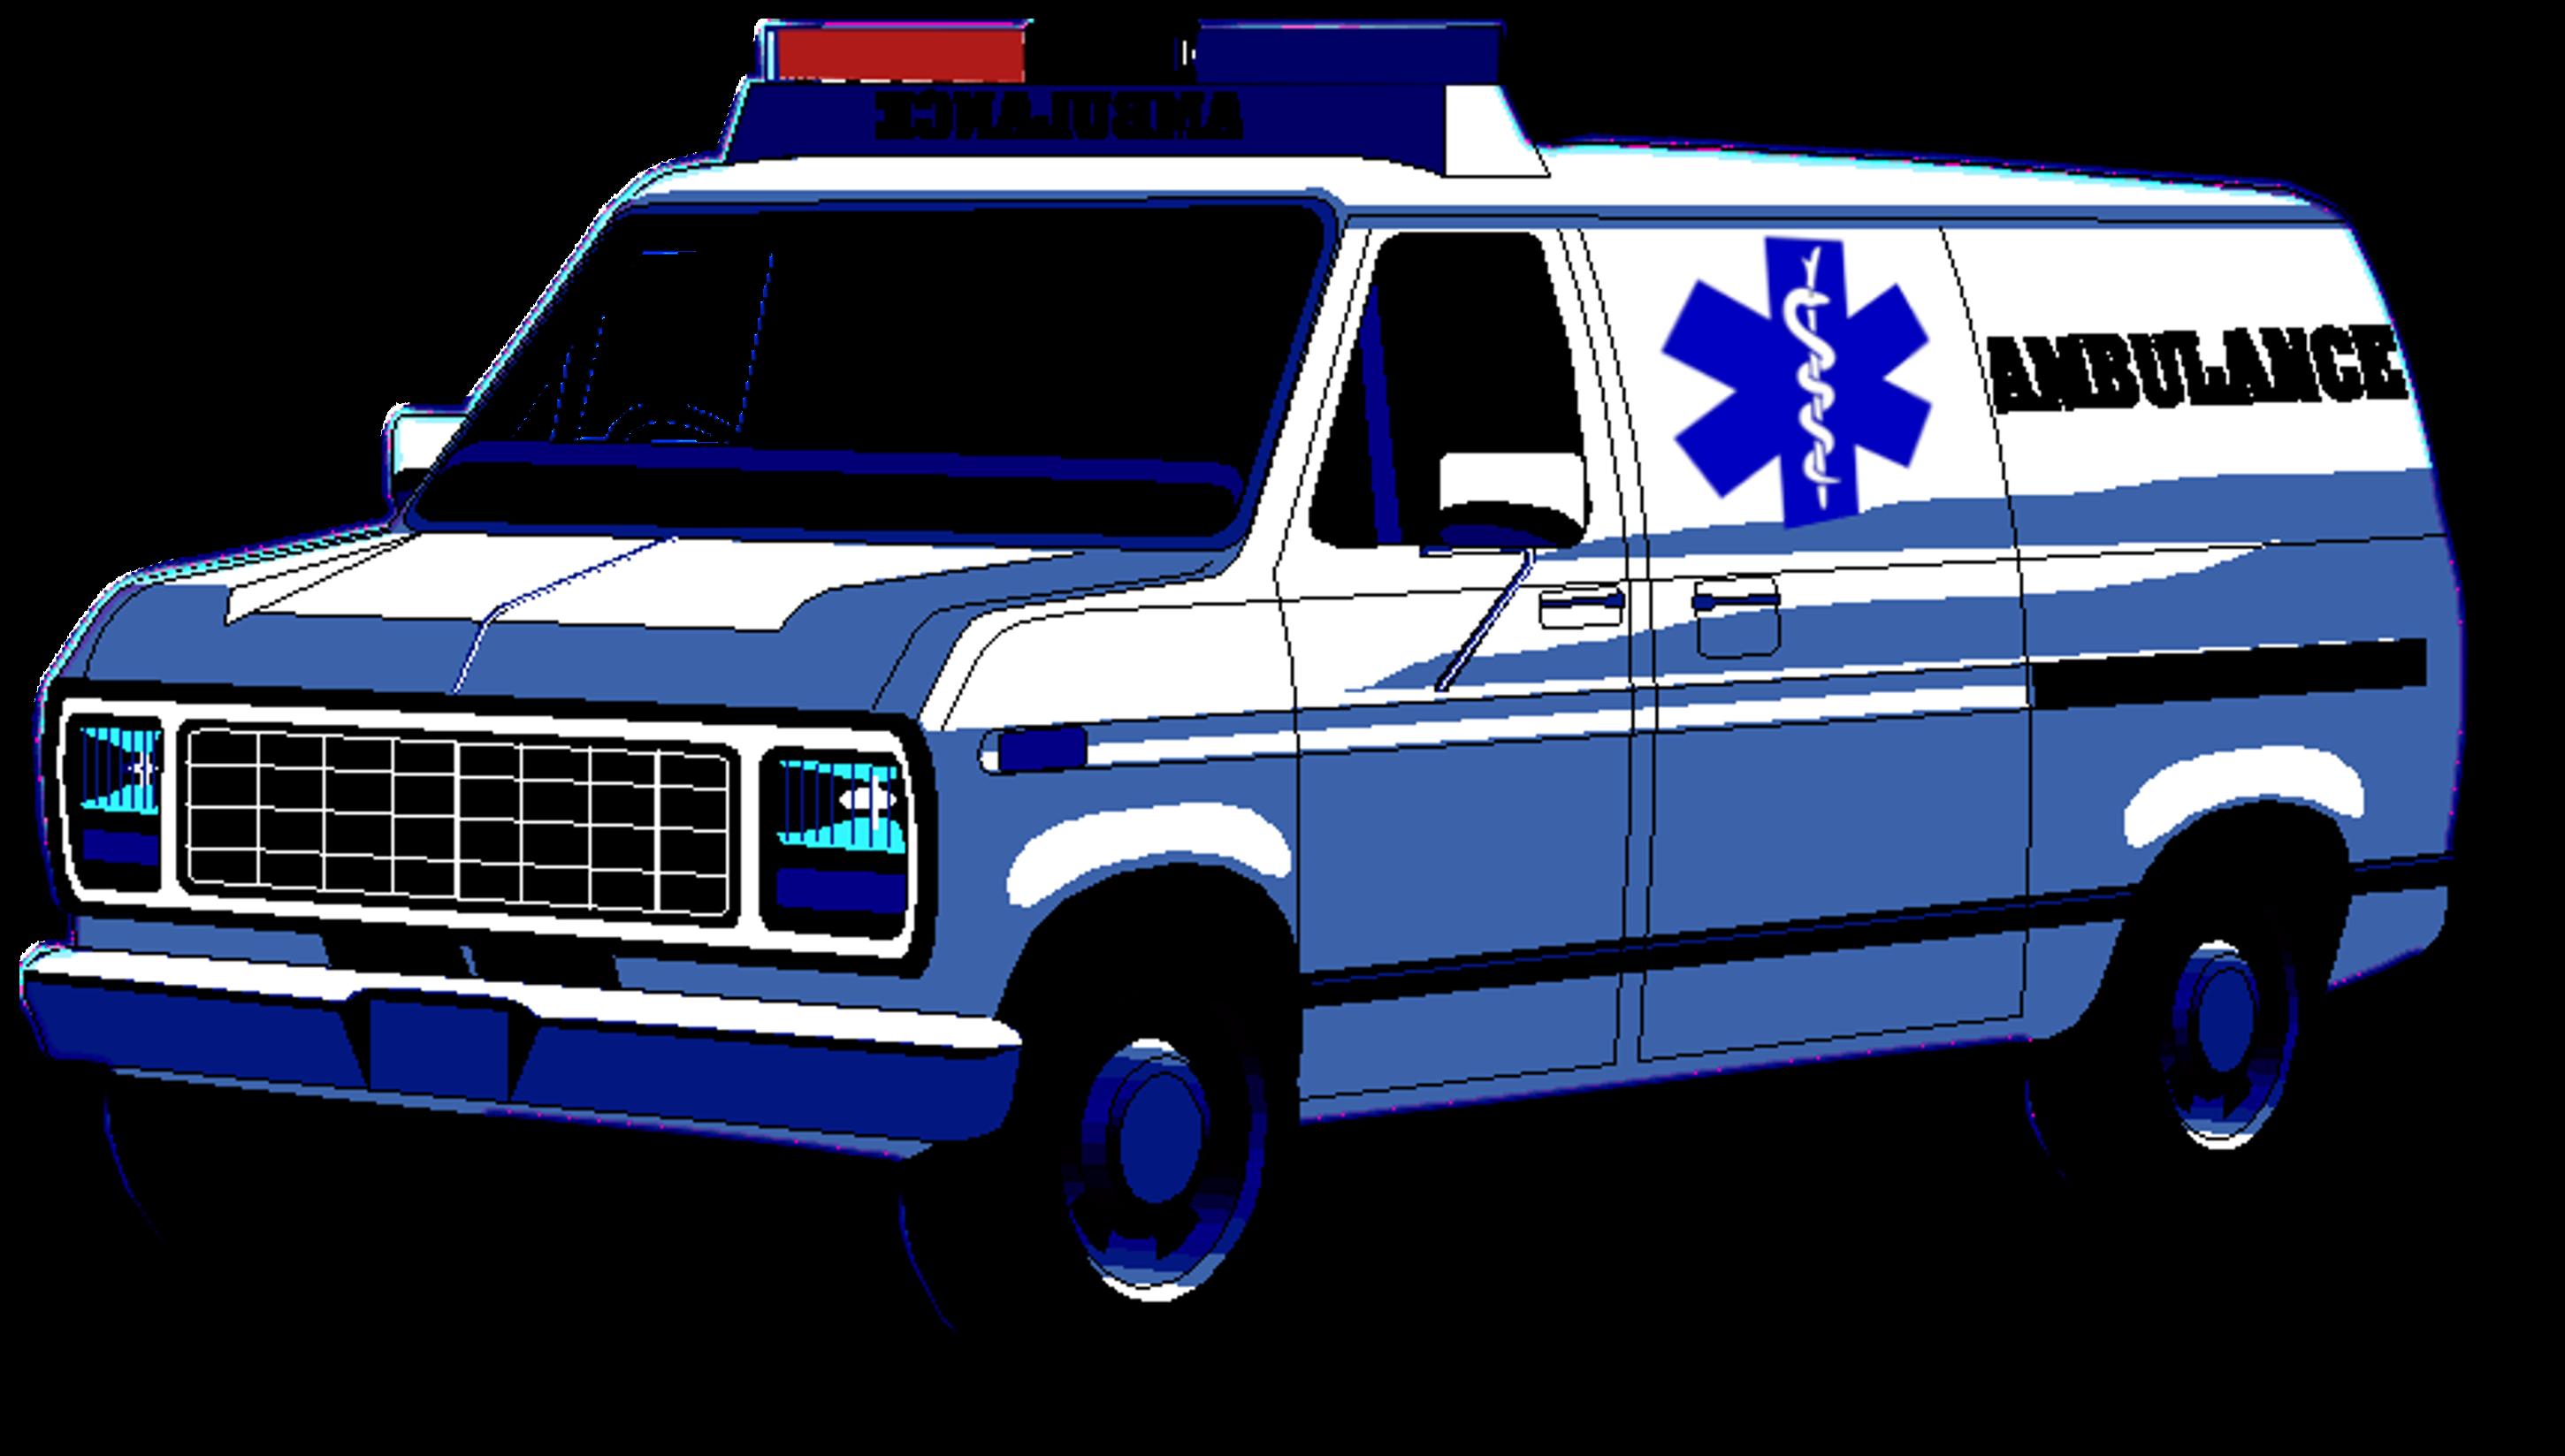 X ambulance free images. Land clipart cartoon